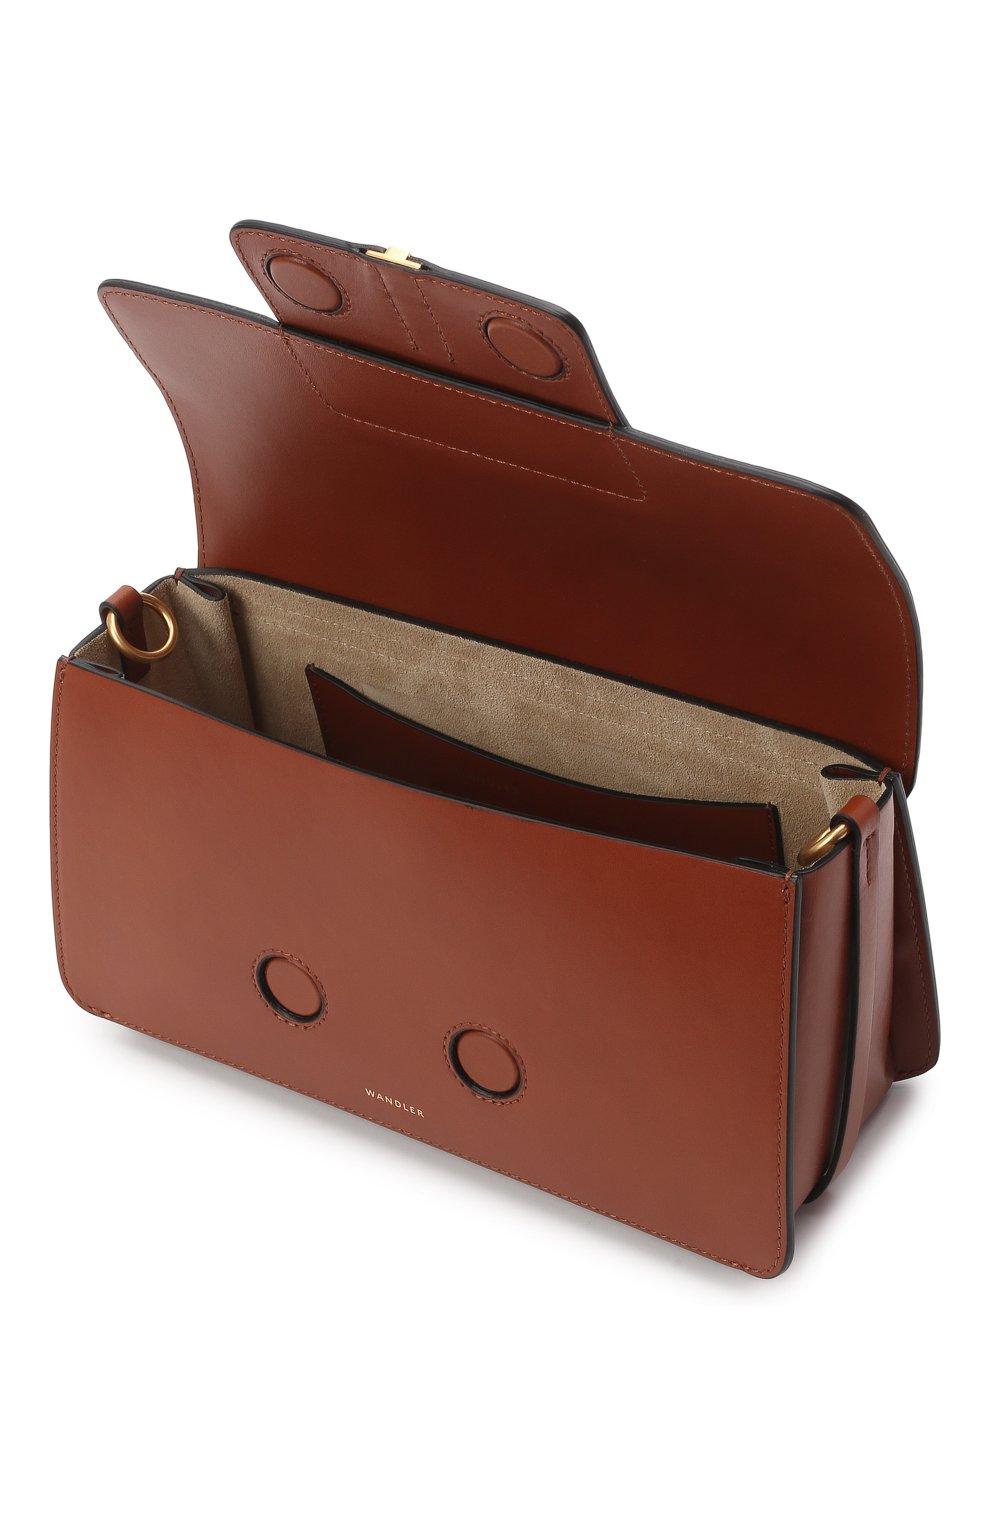 Женская сумка georgia WANDLER коричневого цвета, арт. GE0RGIA BAG   Фото 4 (Сумки-технические: Сумки через плечо, Сумки top-handle; Материал: Натуральная кожа; Размер: small)